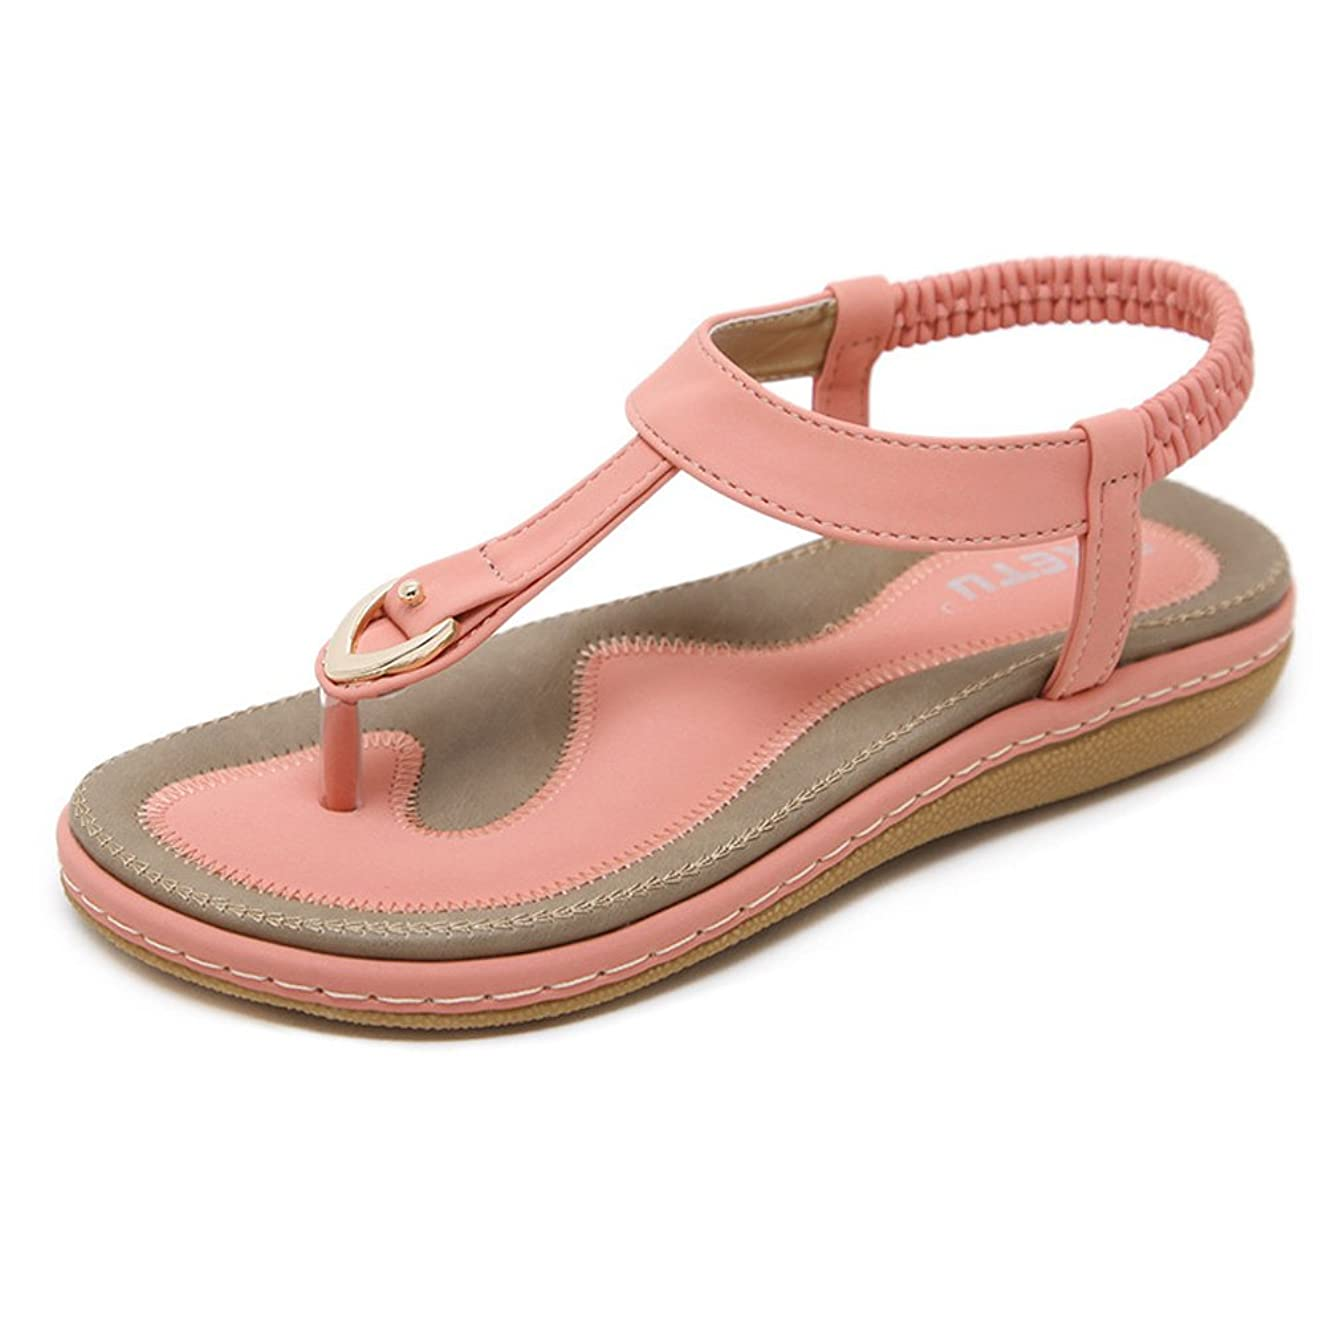 MayBest Womens Summer Clip Toe Sandals Ladies Roman Flip Flops T-Strap Flats